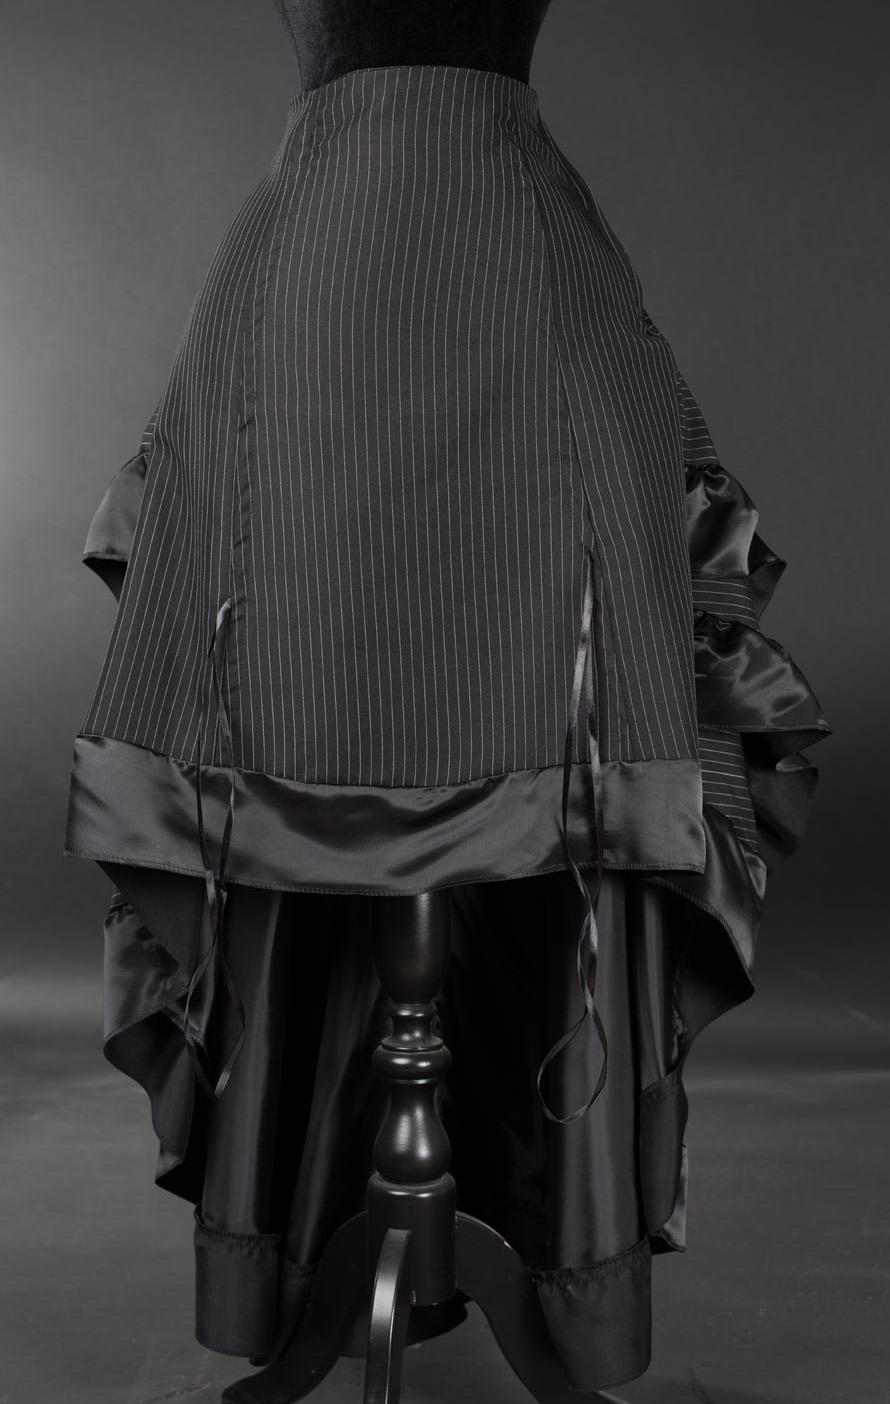 rebelsmarket_black_white_pinstripe_adjustable_long_bustle_3_layer_victorian_goth_skirt__skirts_4.jpg